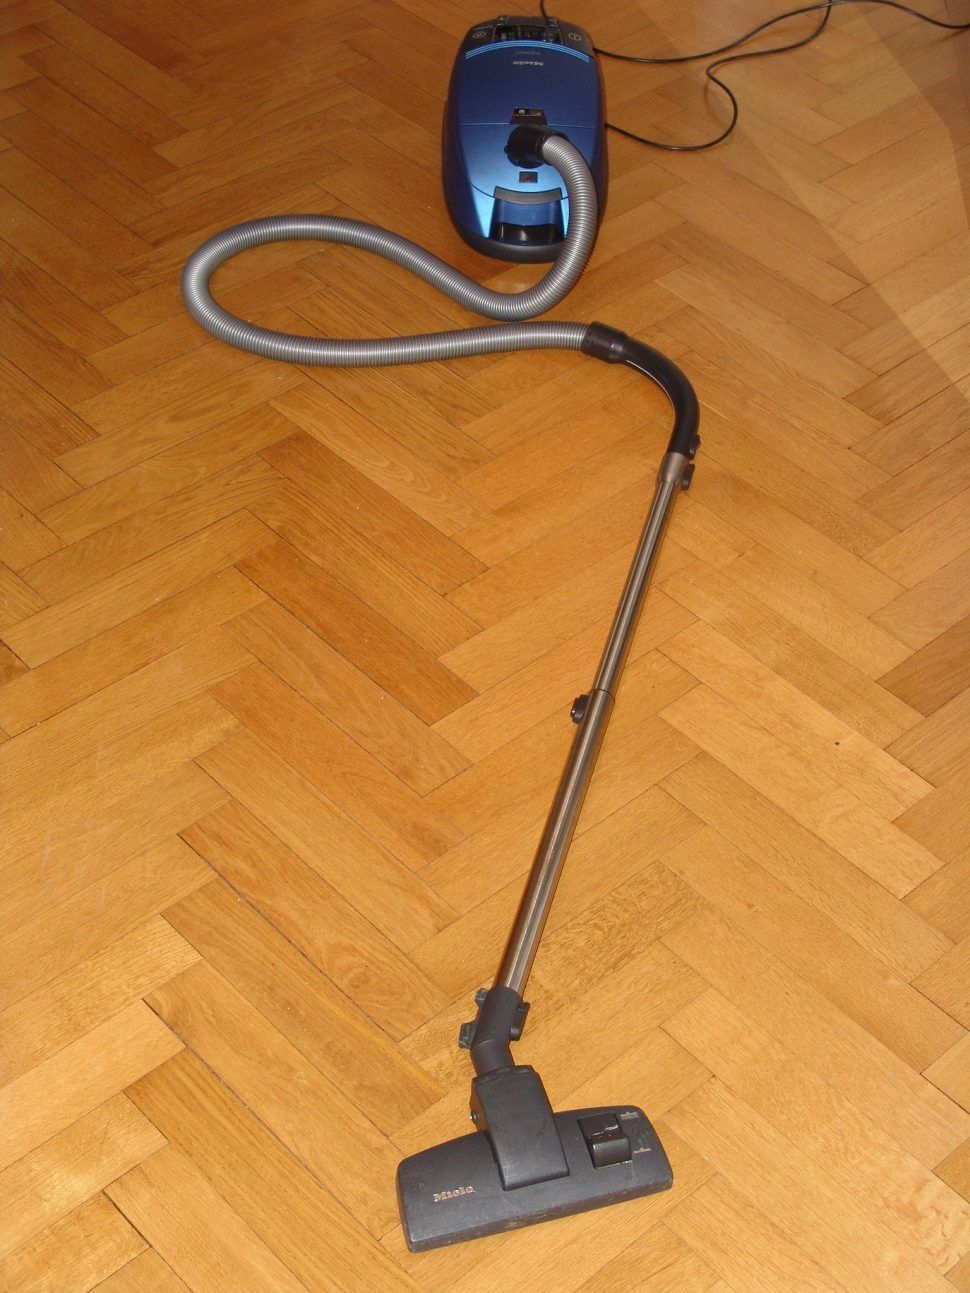 Miele Canister Vacuum Hardwood Floors Httpglblcomcom - What is the best sweeper for hardwood floors